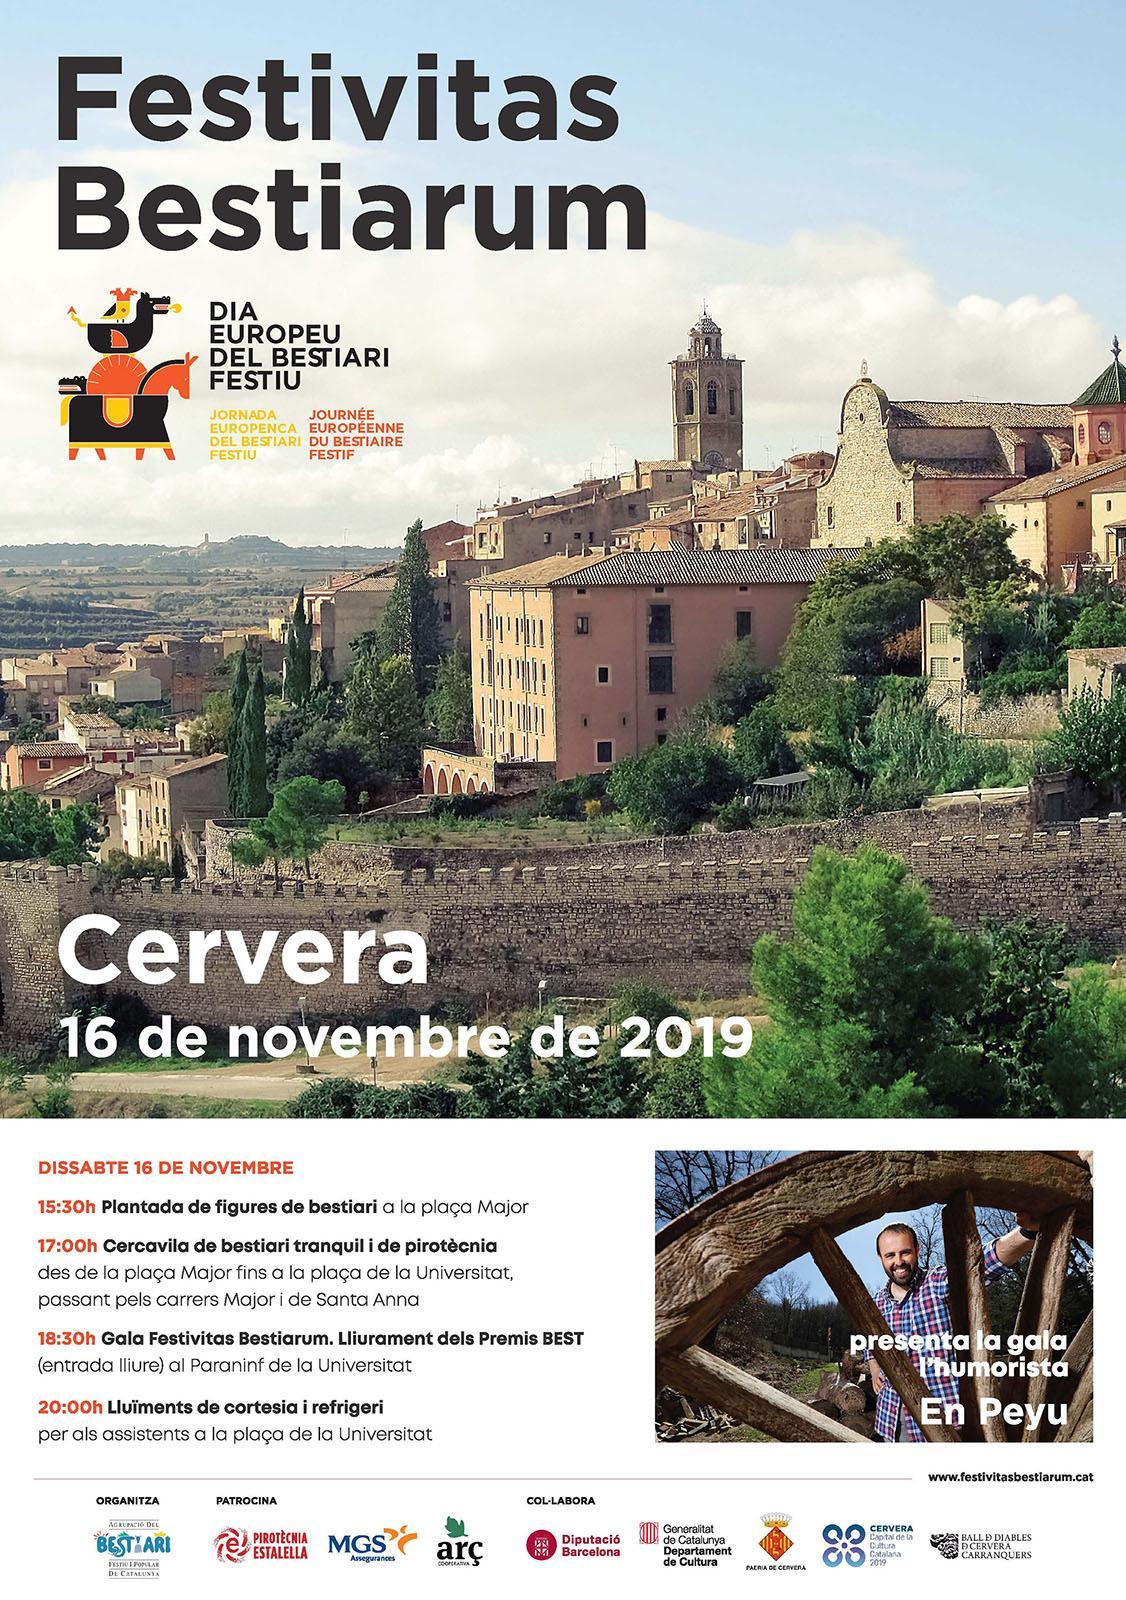 cartell Festivitas Bestiarum 2019